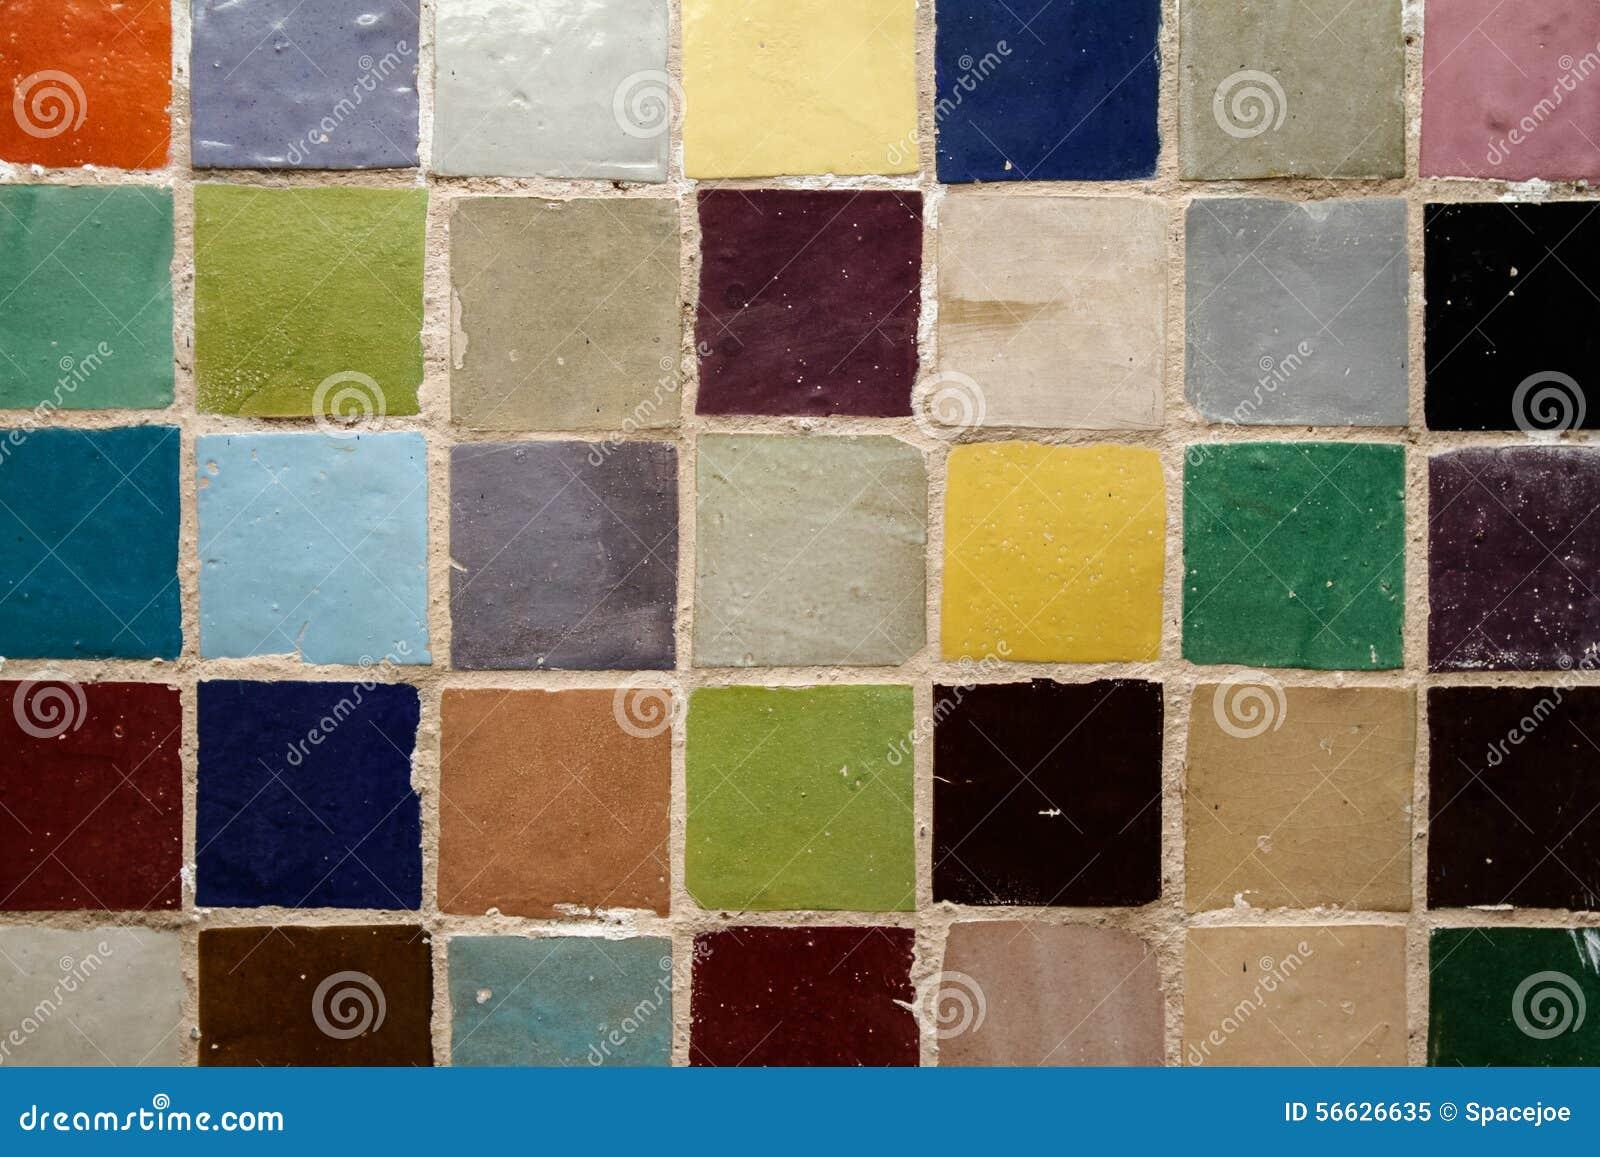 couleurs de zellige de marocain image stock image 56626635. Black Bedroom Furniture Sets. Home Design Ideas